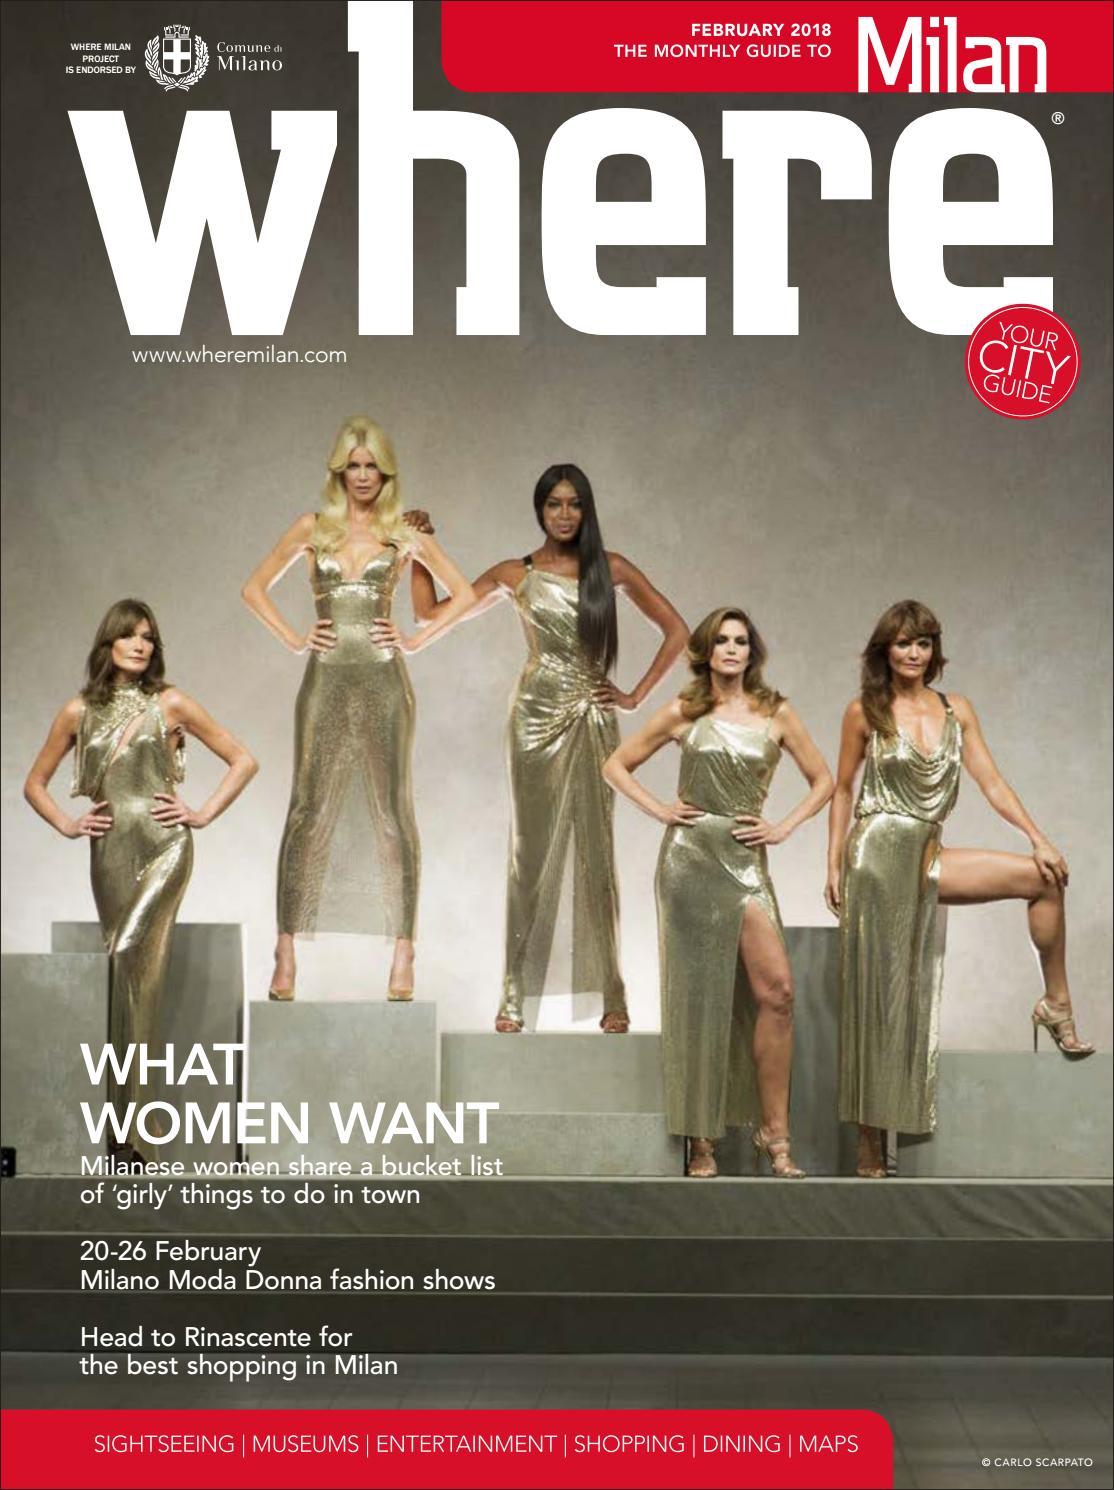 Where Magazine Milan Feb 2018 by Morris Media Network - issuu